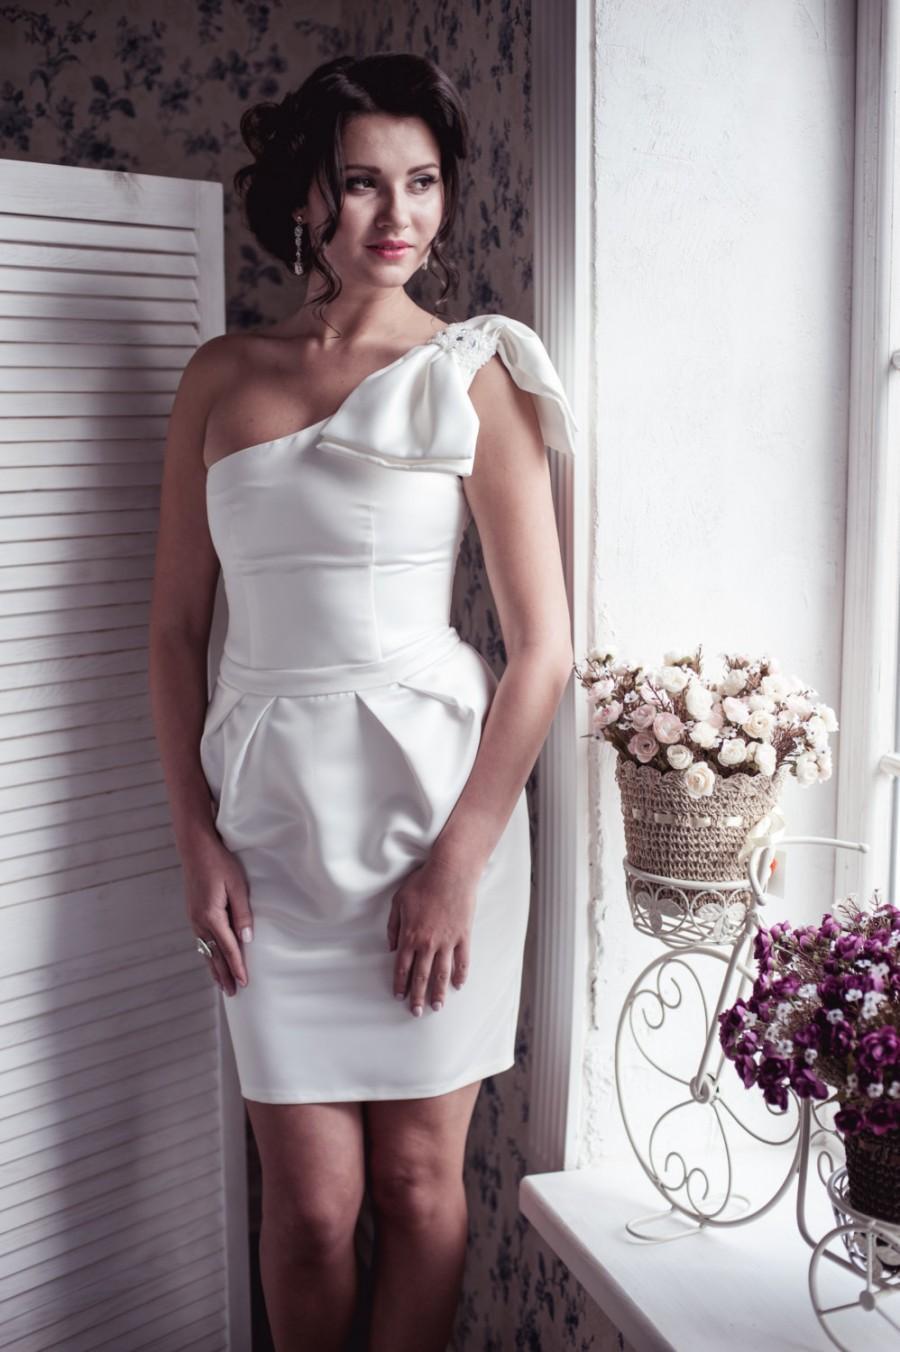 b641ccdaaf ON SALE One-shoulder pleated tulip skirt short wedding dress, little white  dress M9, Romantic wedding gown, Classic bridal dress